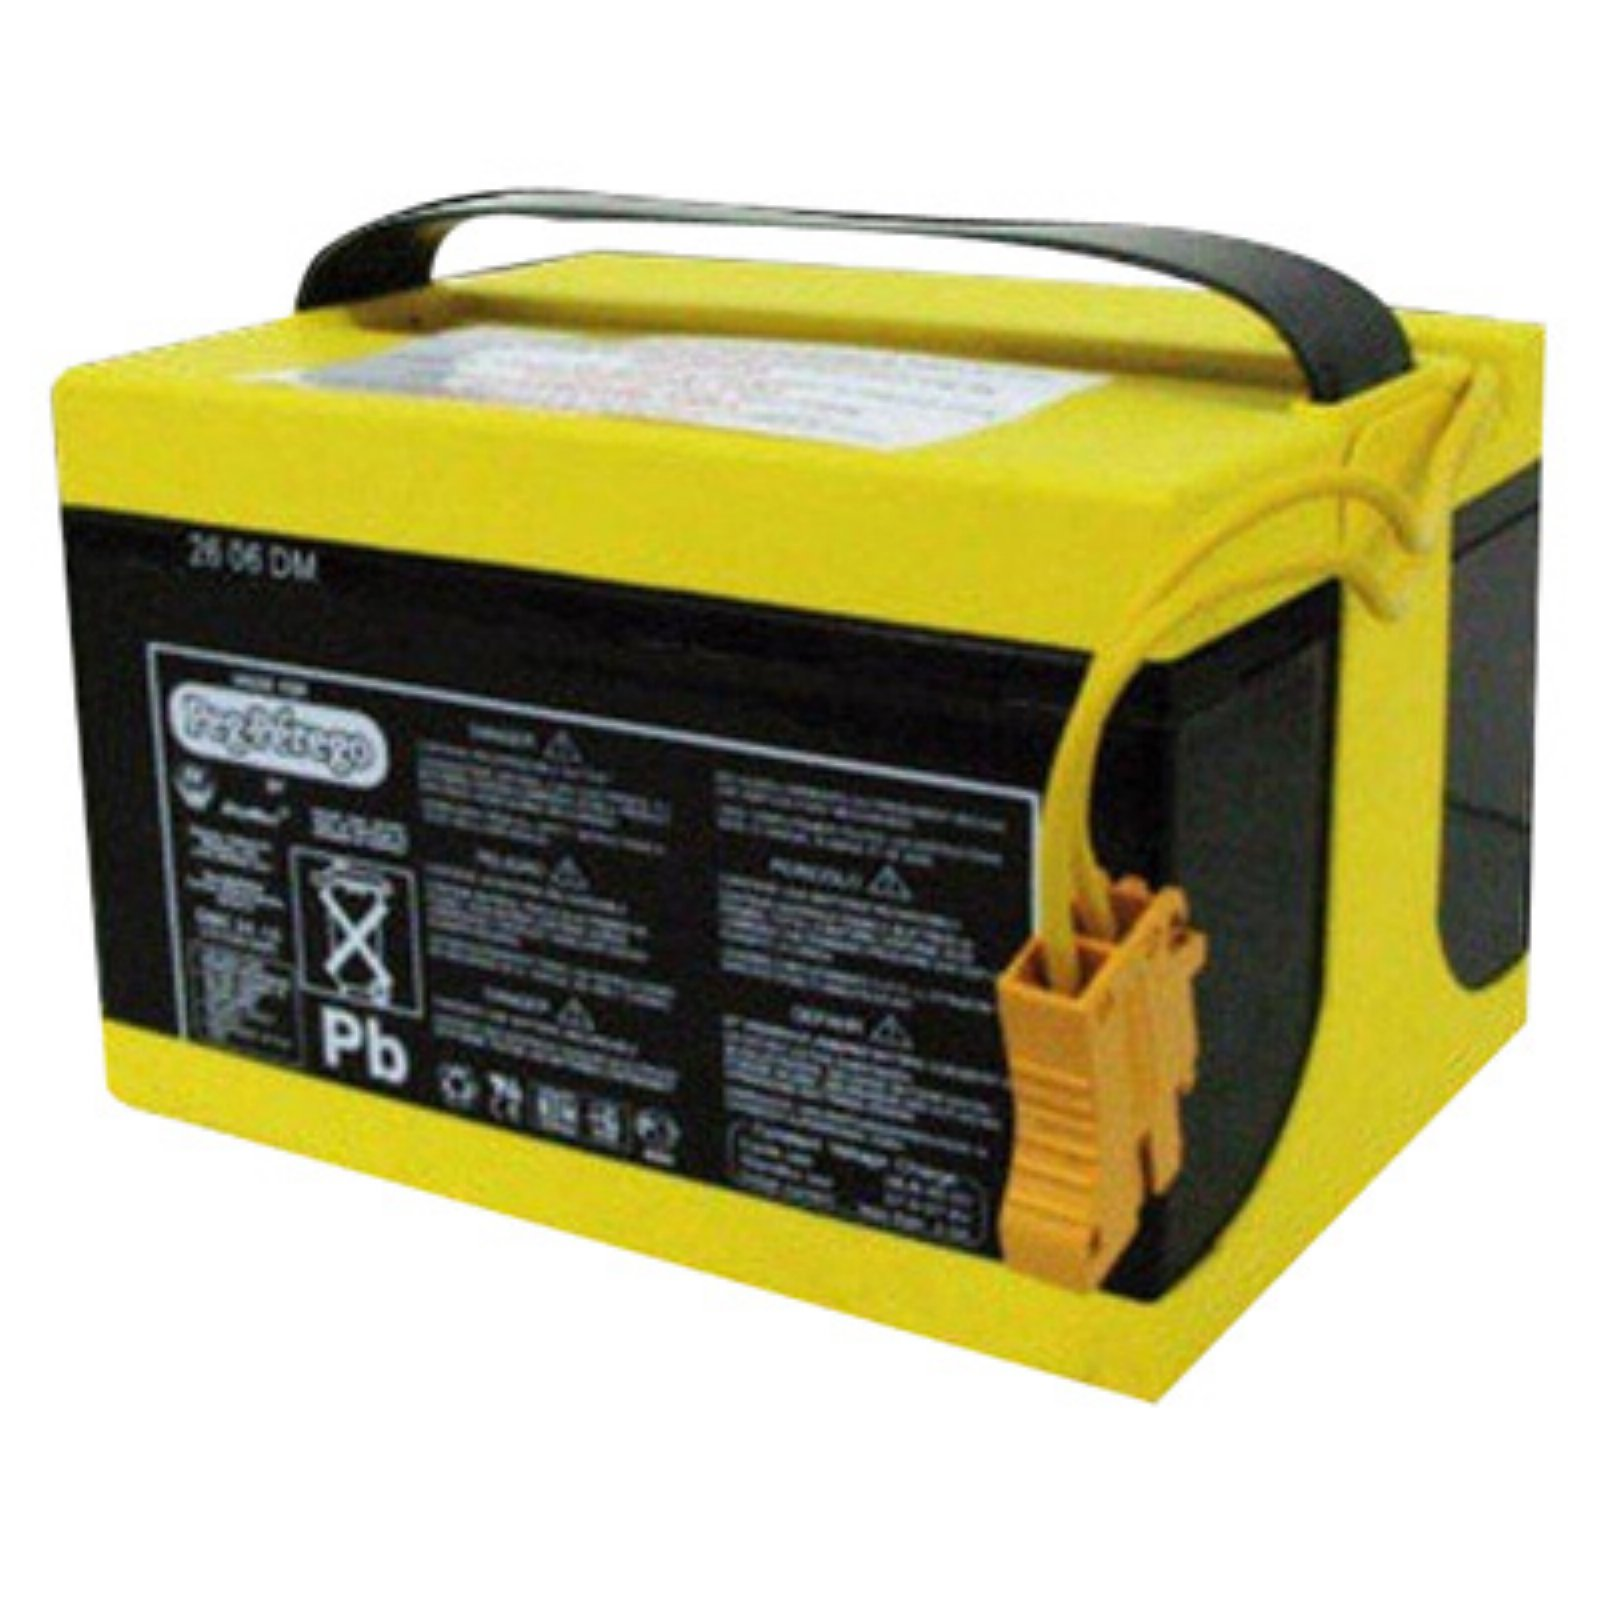 Peg Perego 24-Volt Battery